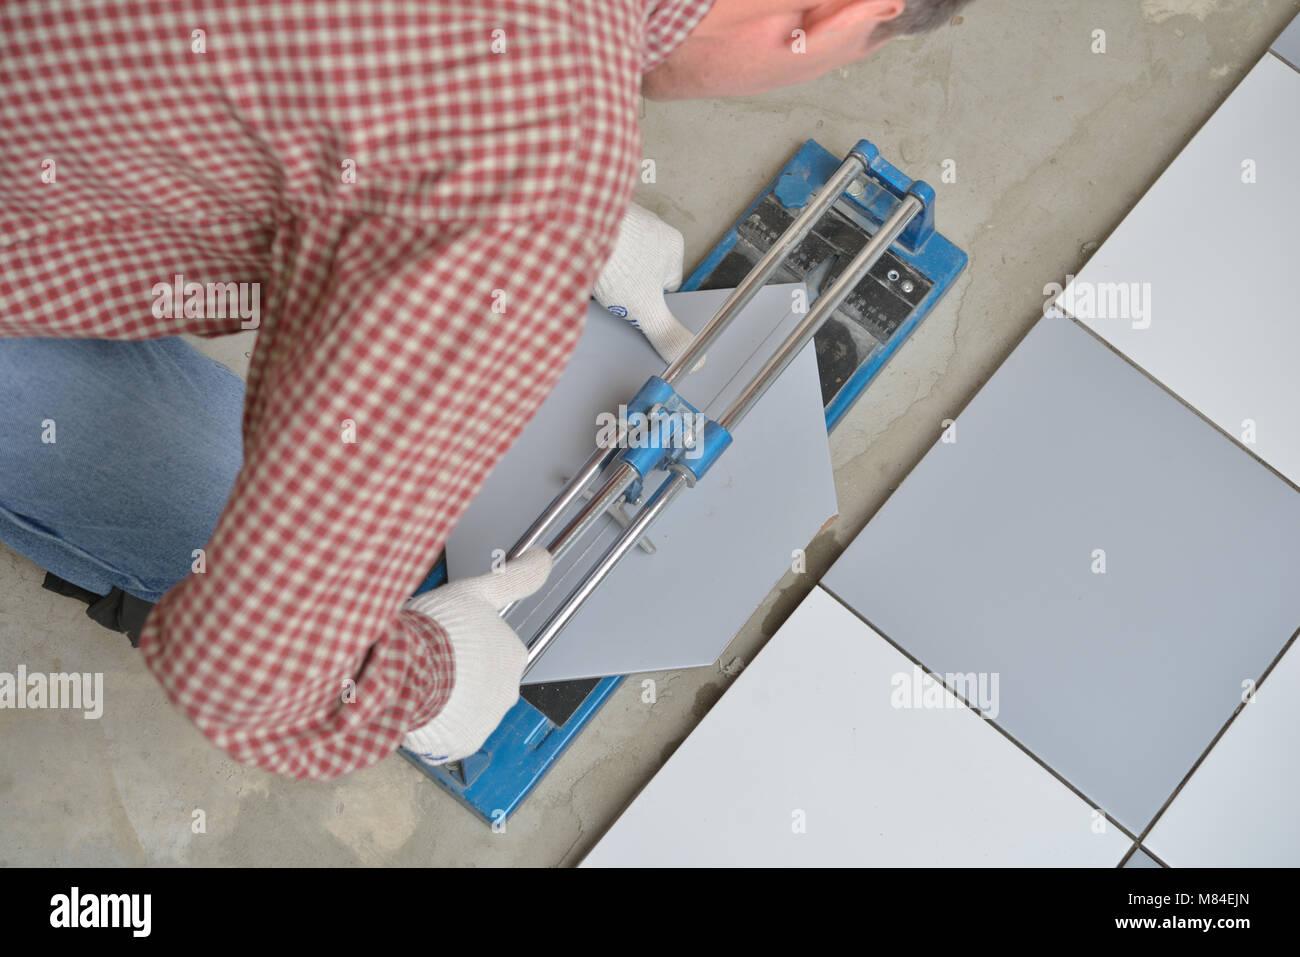 Ceramic tiles tools tiler floor stock photos ceramic tiles tools tiler cutting ceramic tiles during floor installation stock image dailygadgetfo Image collections